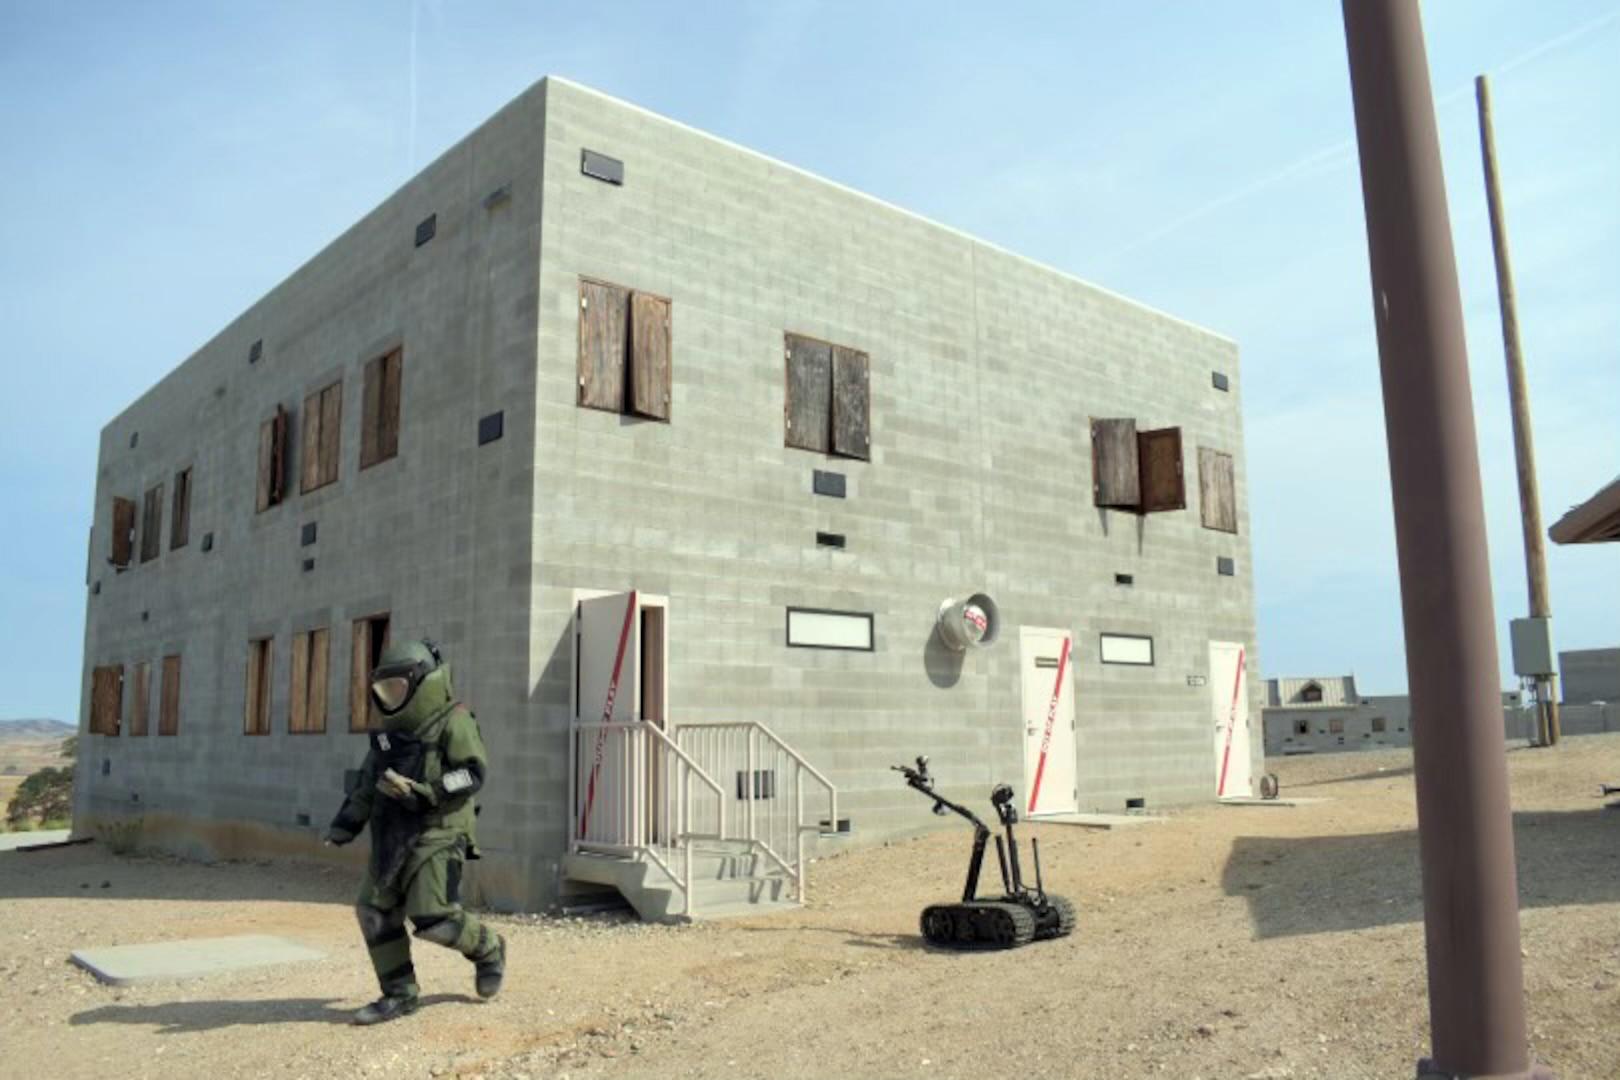 A Washington National Guardsman participates in an explosive ordnance disposal exercise on June 18, 2021, at Camp Roberts, Calif.